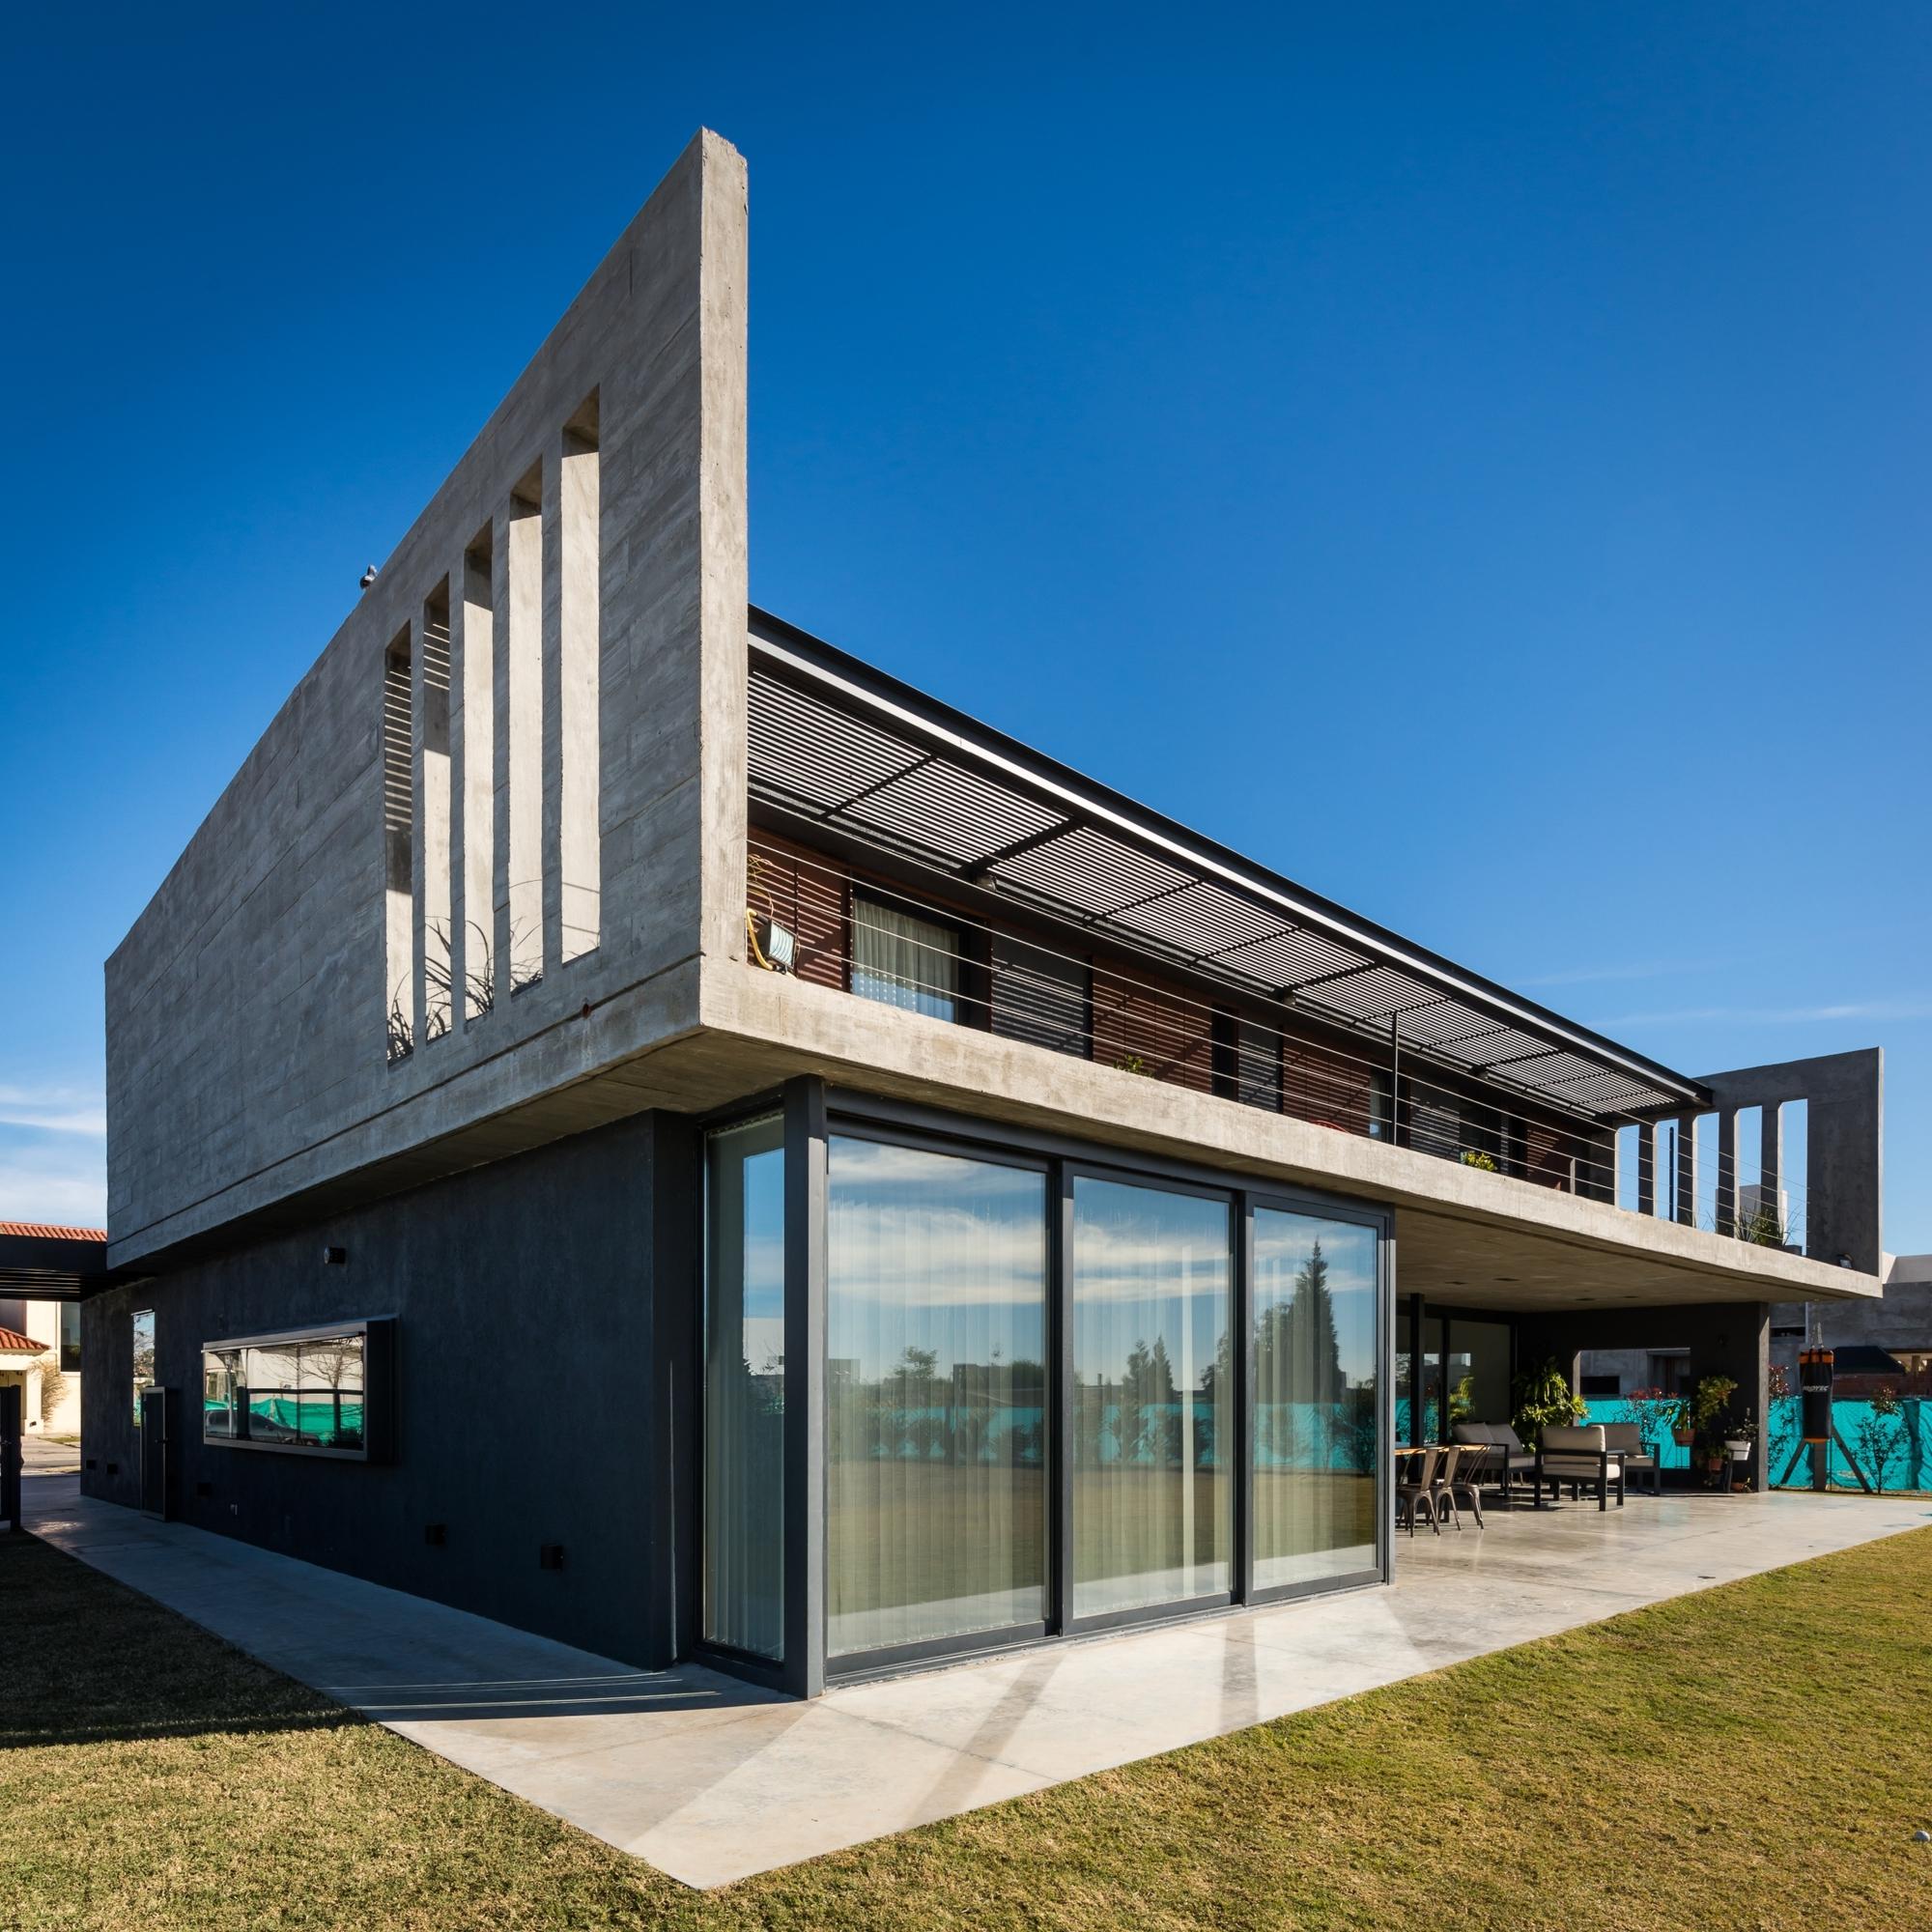 D3 Lounge Project x Plataforma Arquitectura - Minimal Studio